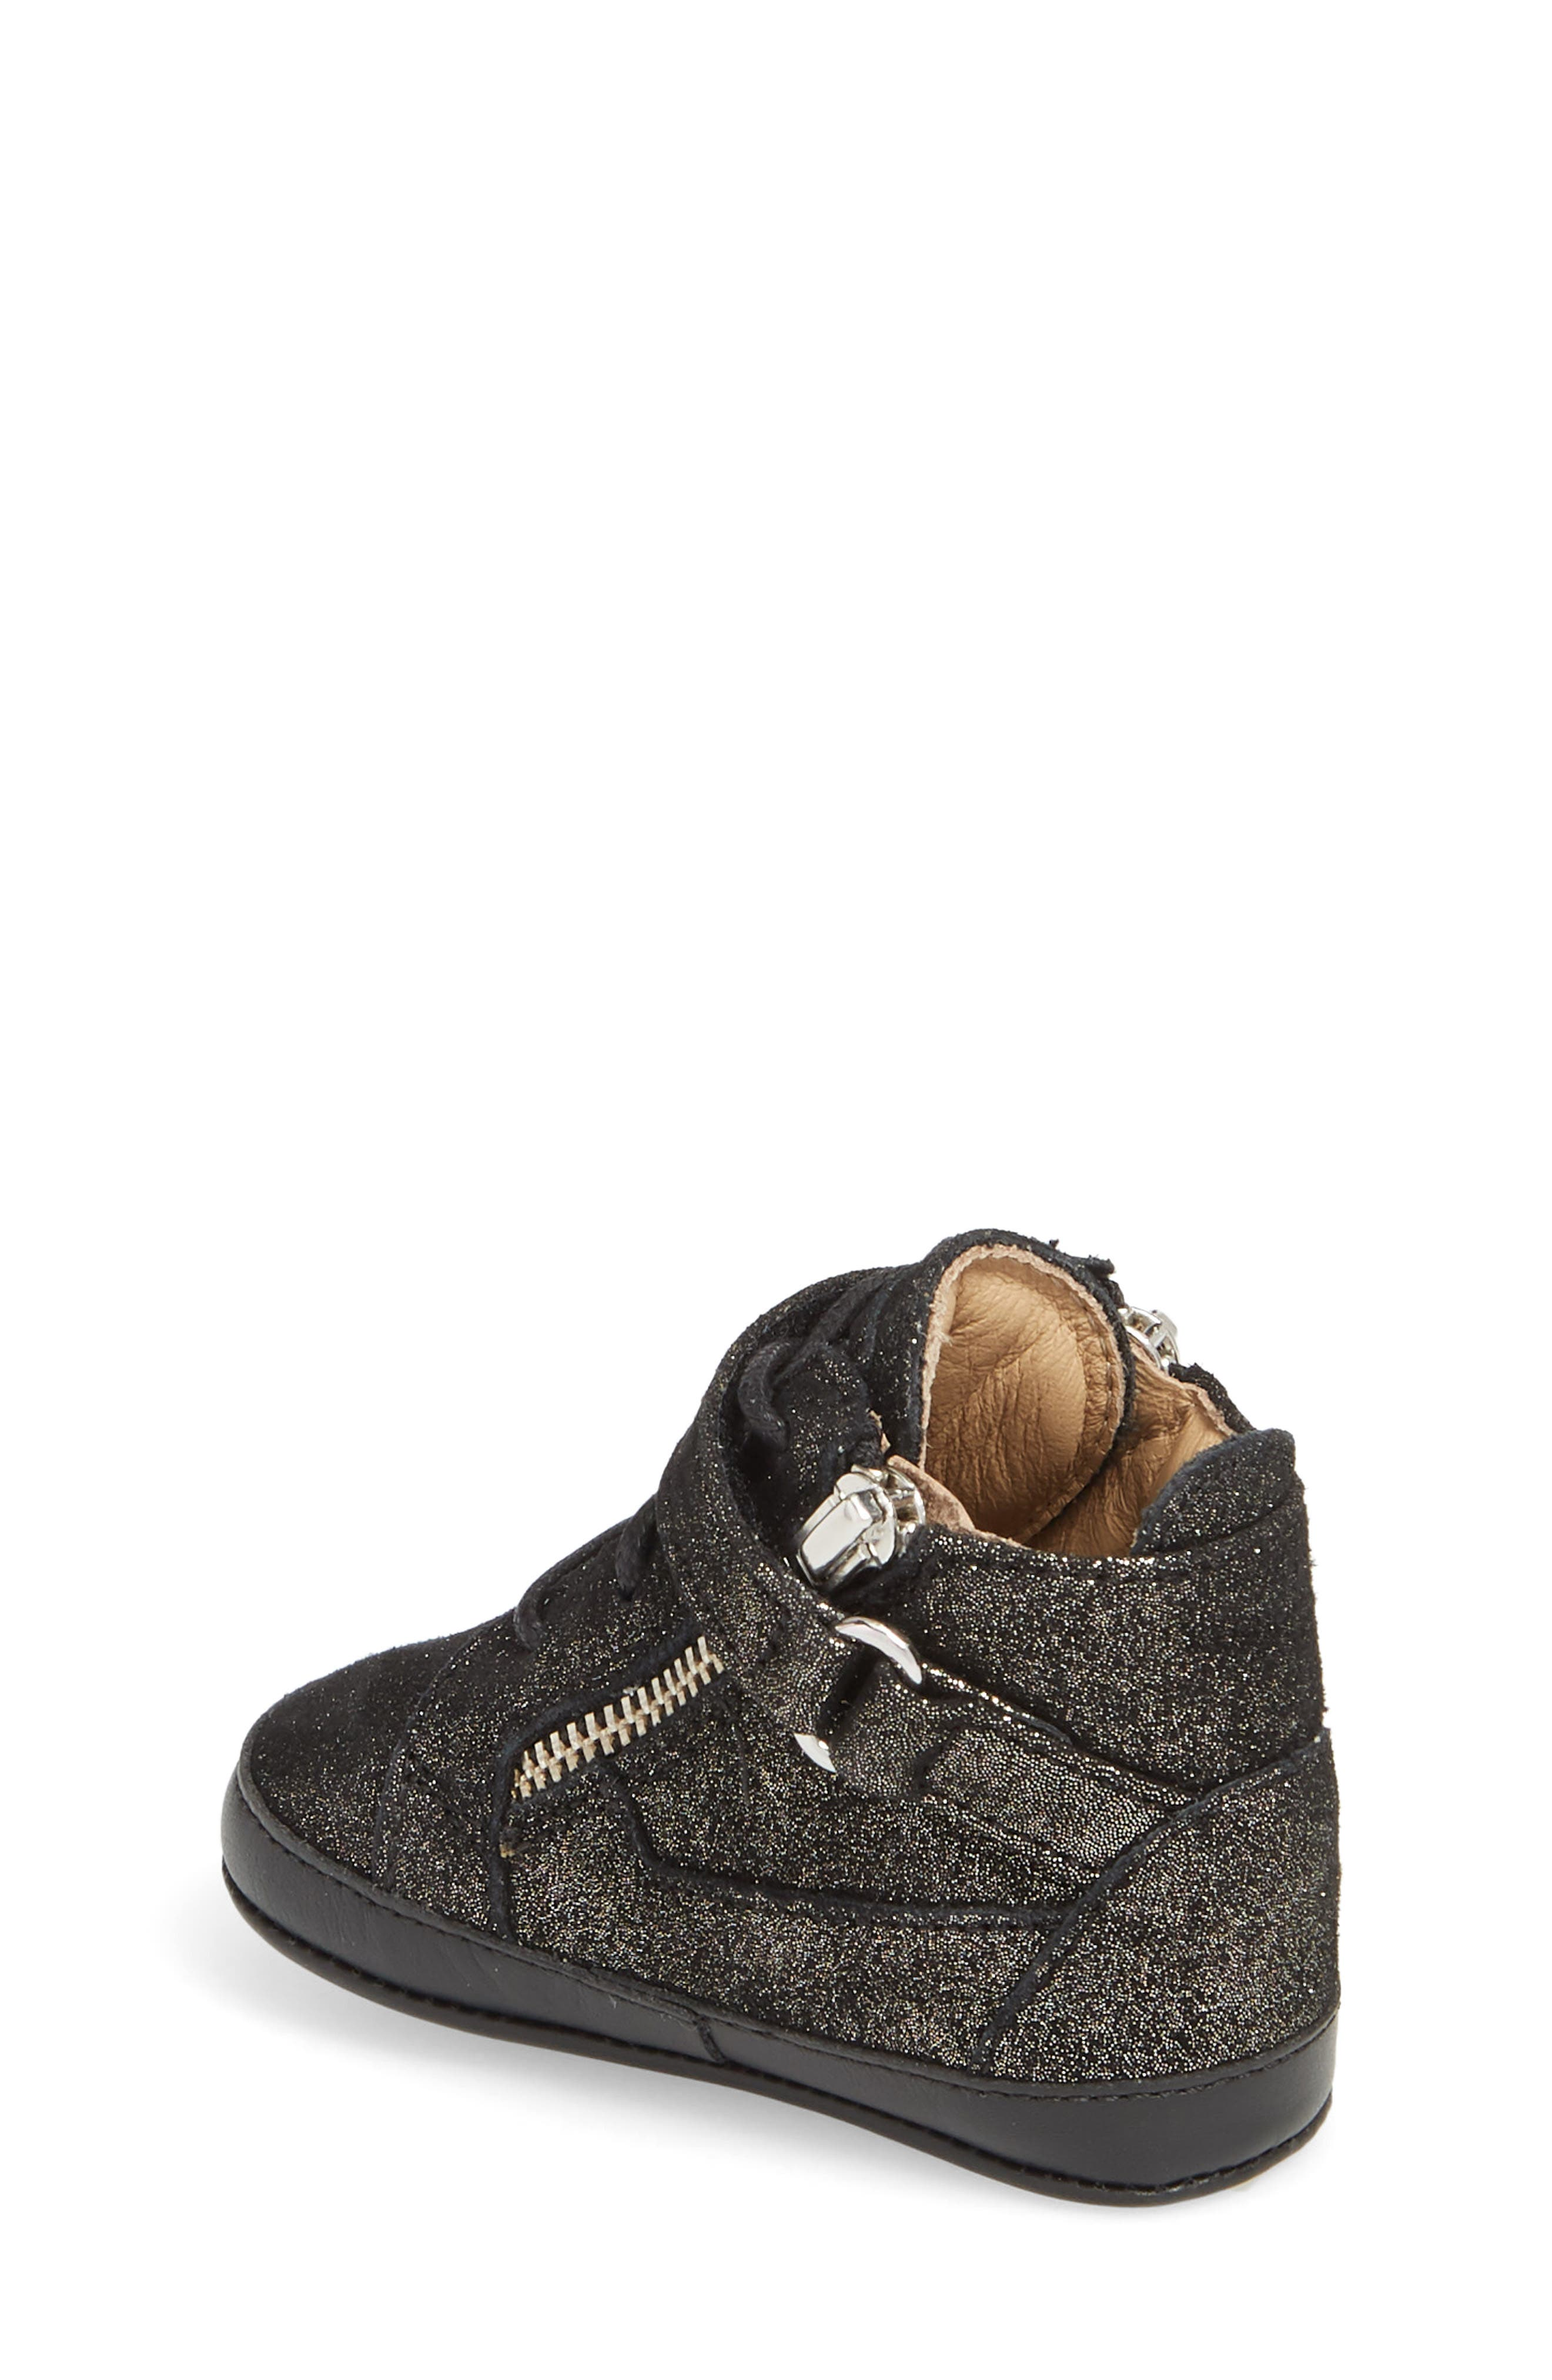 Culla London High Top Crib Sneaker,                             Alternate thumbnail 2, color,                             Black Glitter